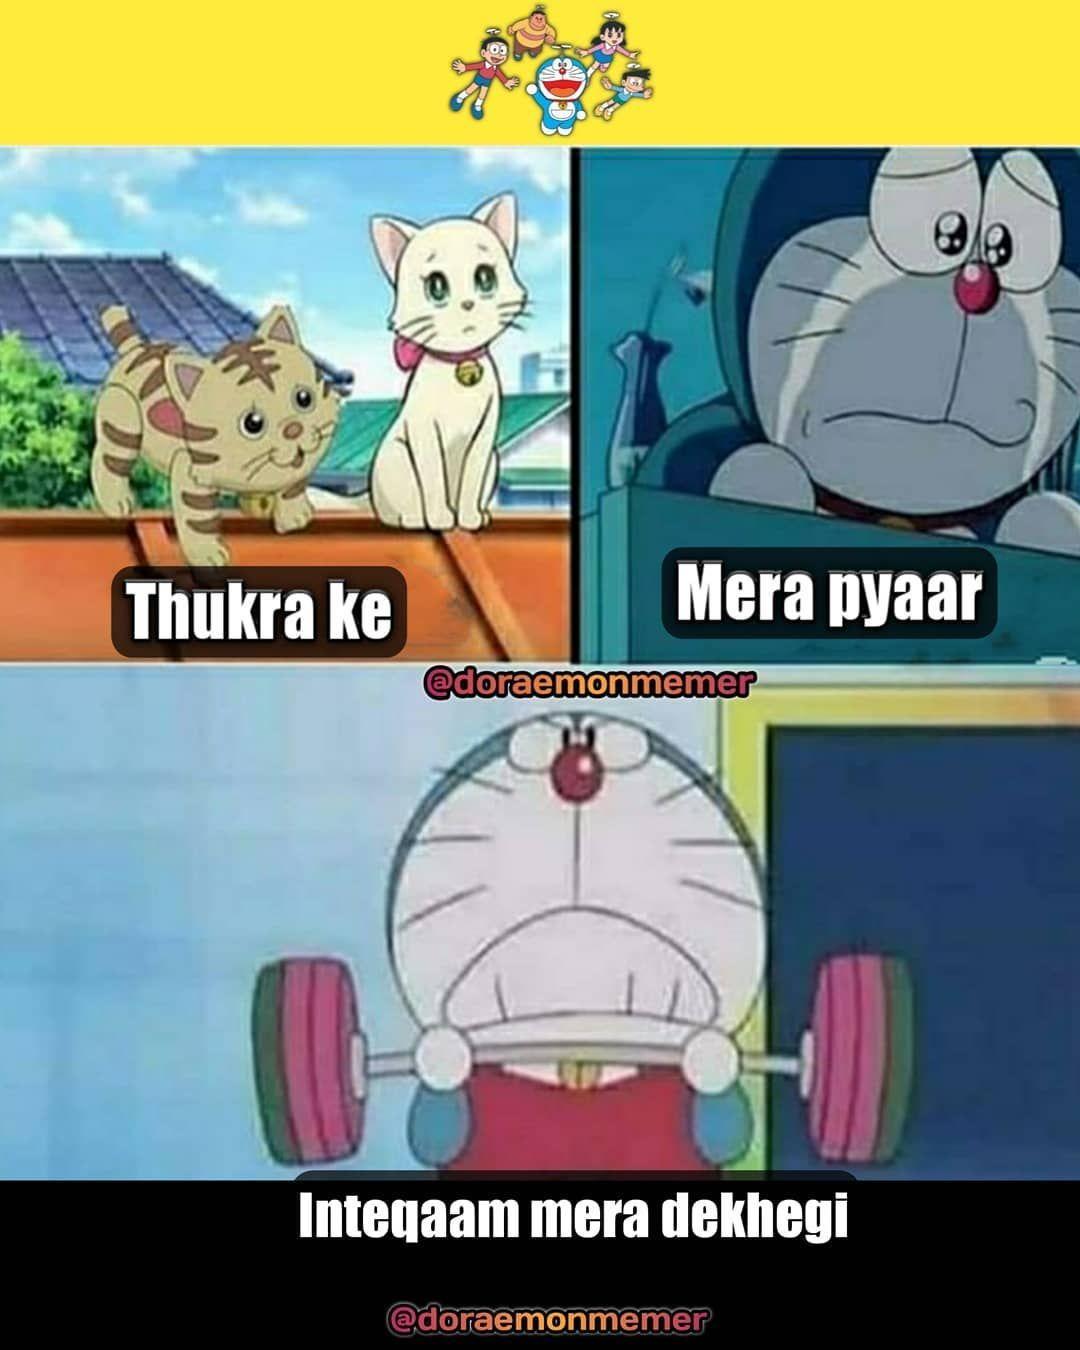 Funny Doraemon Memes Best Funny Doraemon Meme Doraemon English Meme Doraemon Hindi Meme Best Funny Hindi Meme Funny Memes Images Funny Memes Jokes Quotes